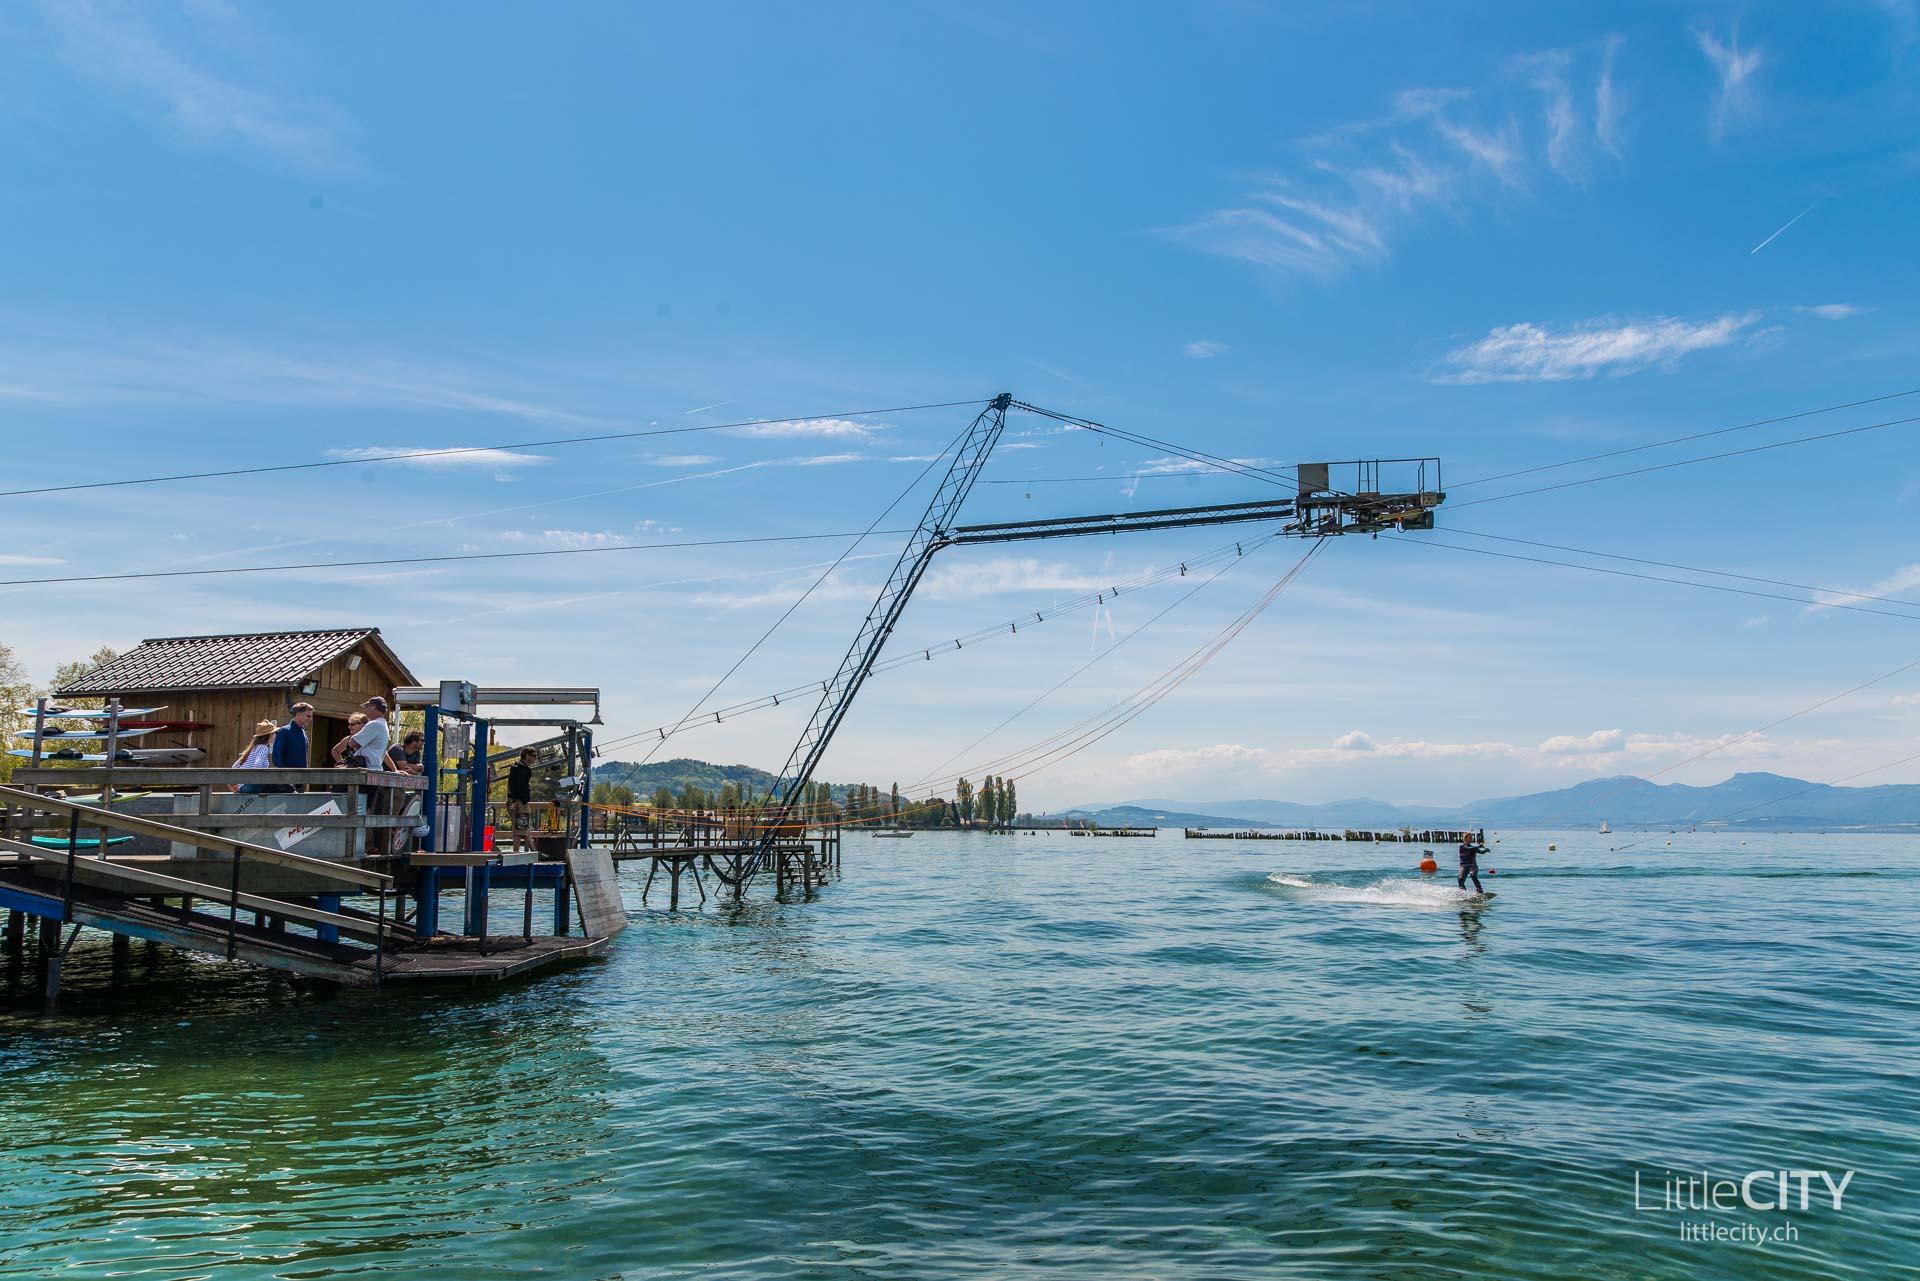 Wasserski Lift Le Rive Sud Estavayer le lac Fribourg